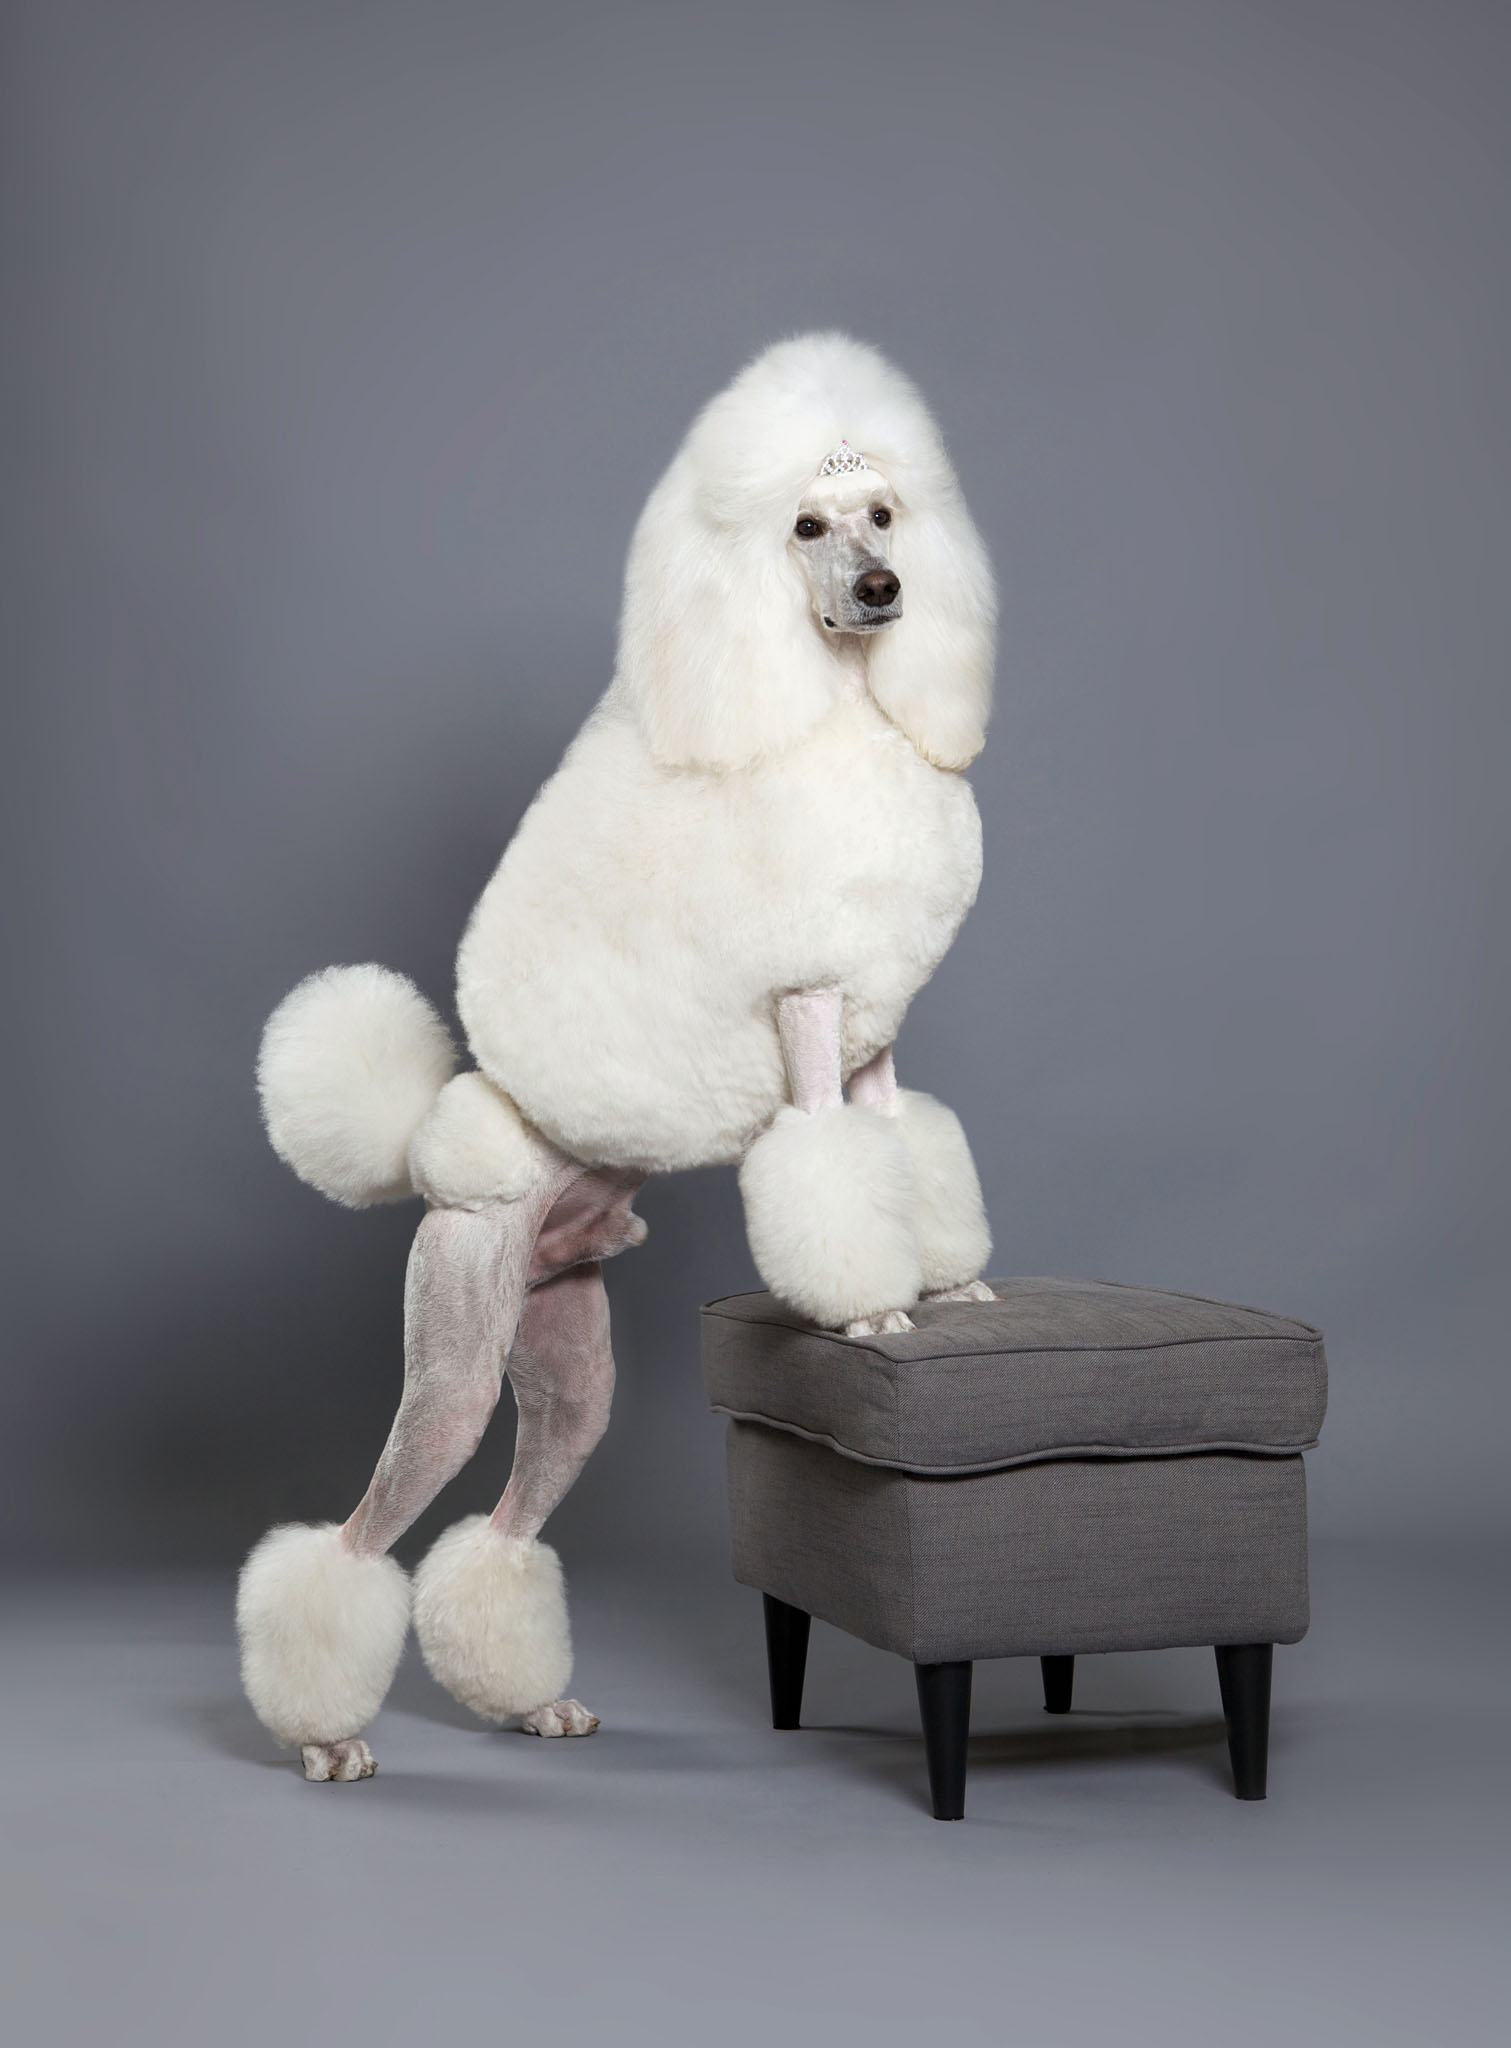 boprey-pet-photography-studio-nyc_10.jpg